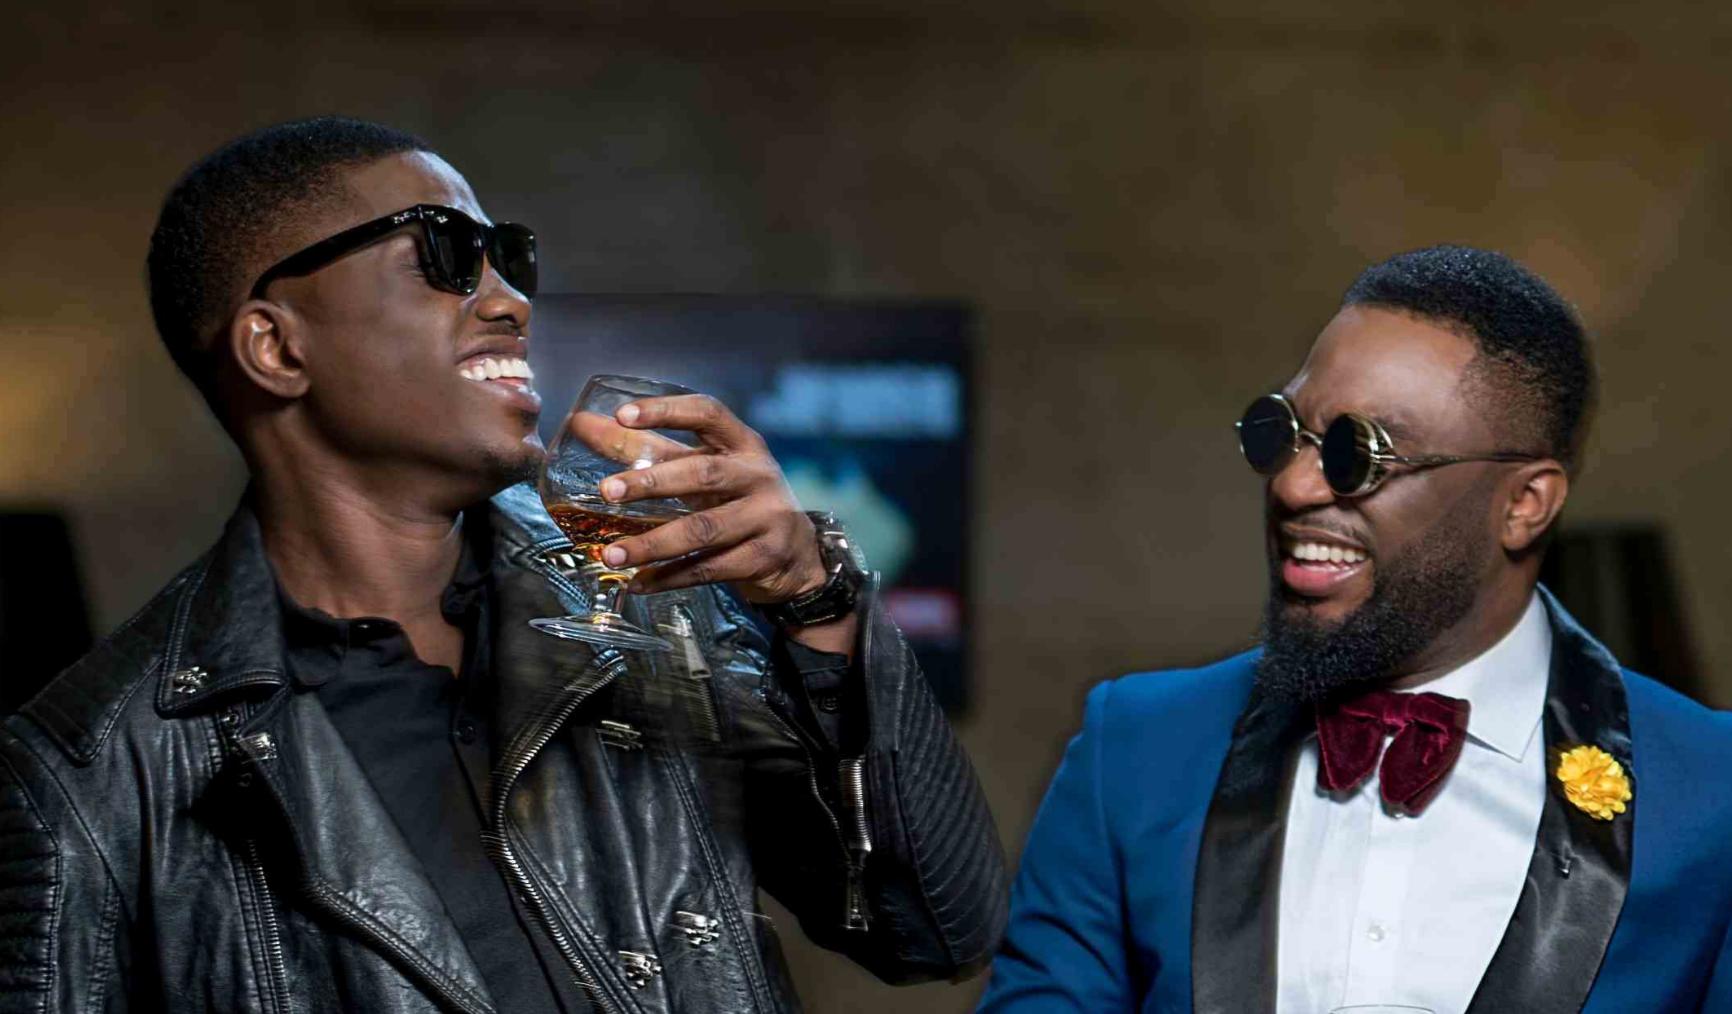 In Nigeria, everybody loves Hennessy